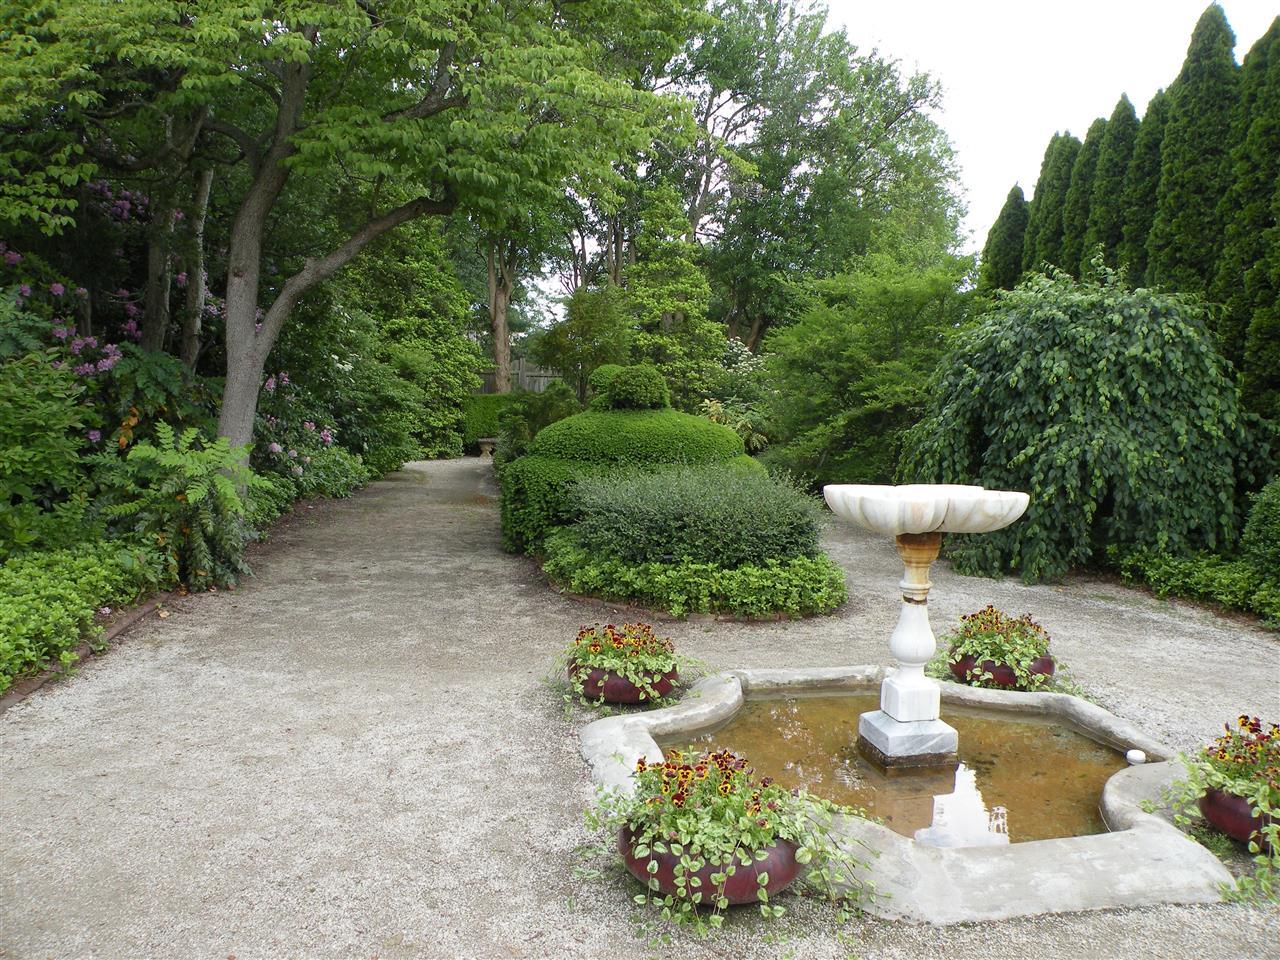 Fountain at Ladew Topiary Garden, Monkton, MD